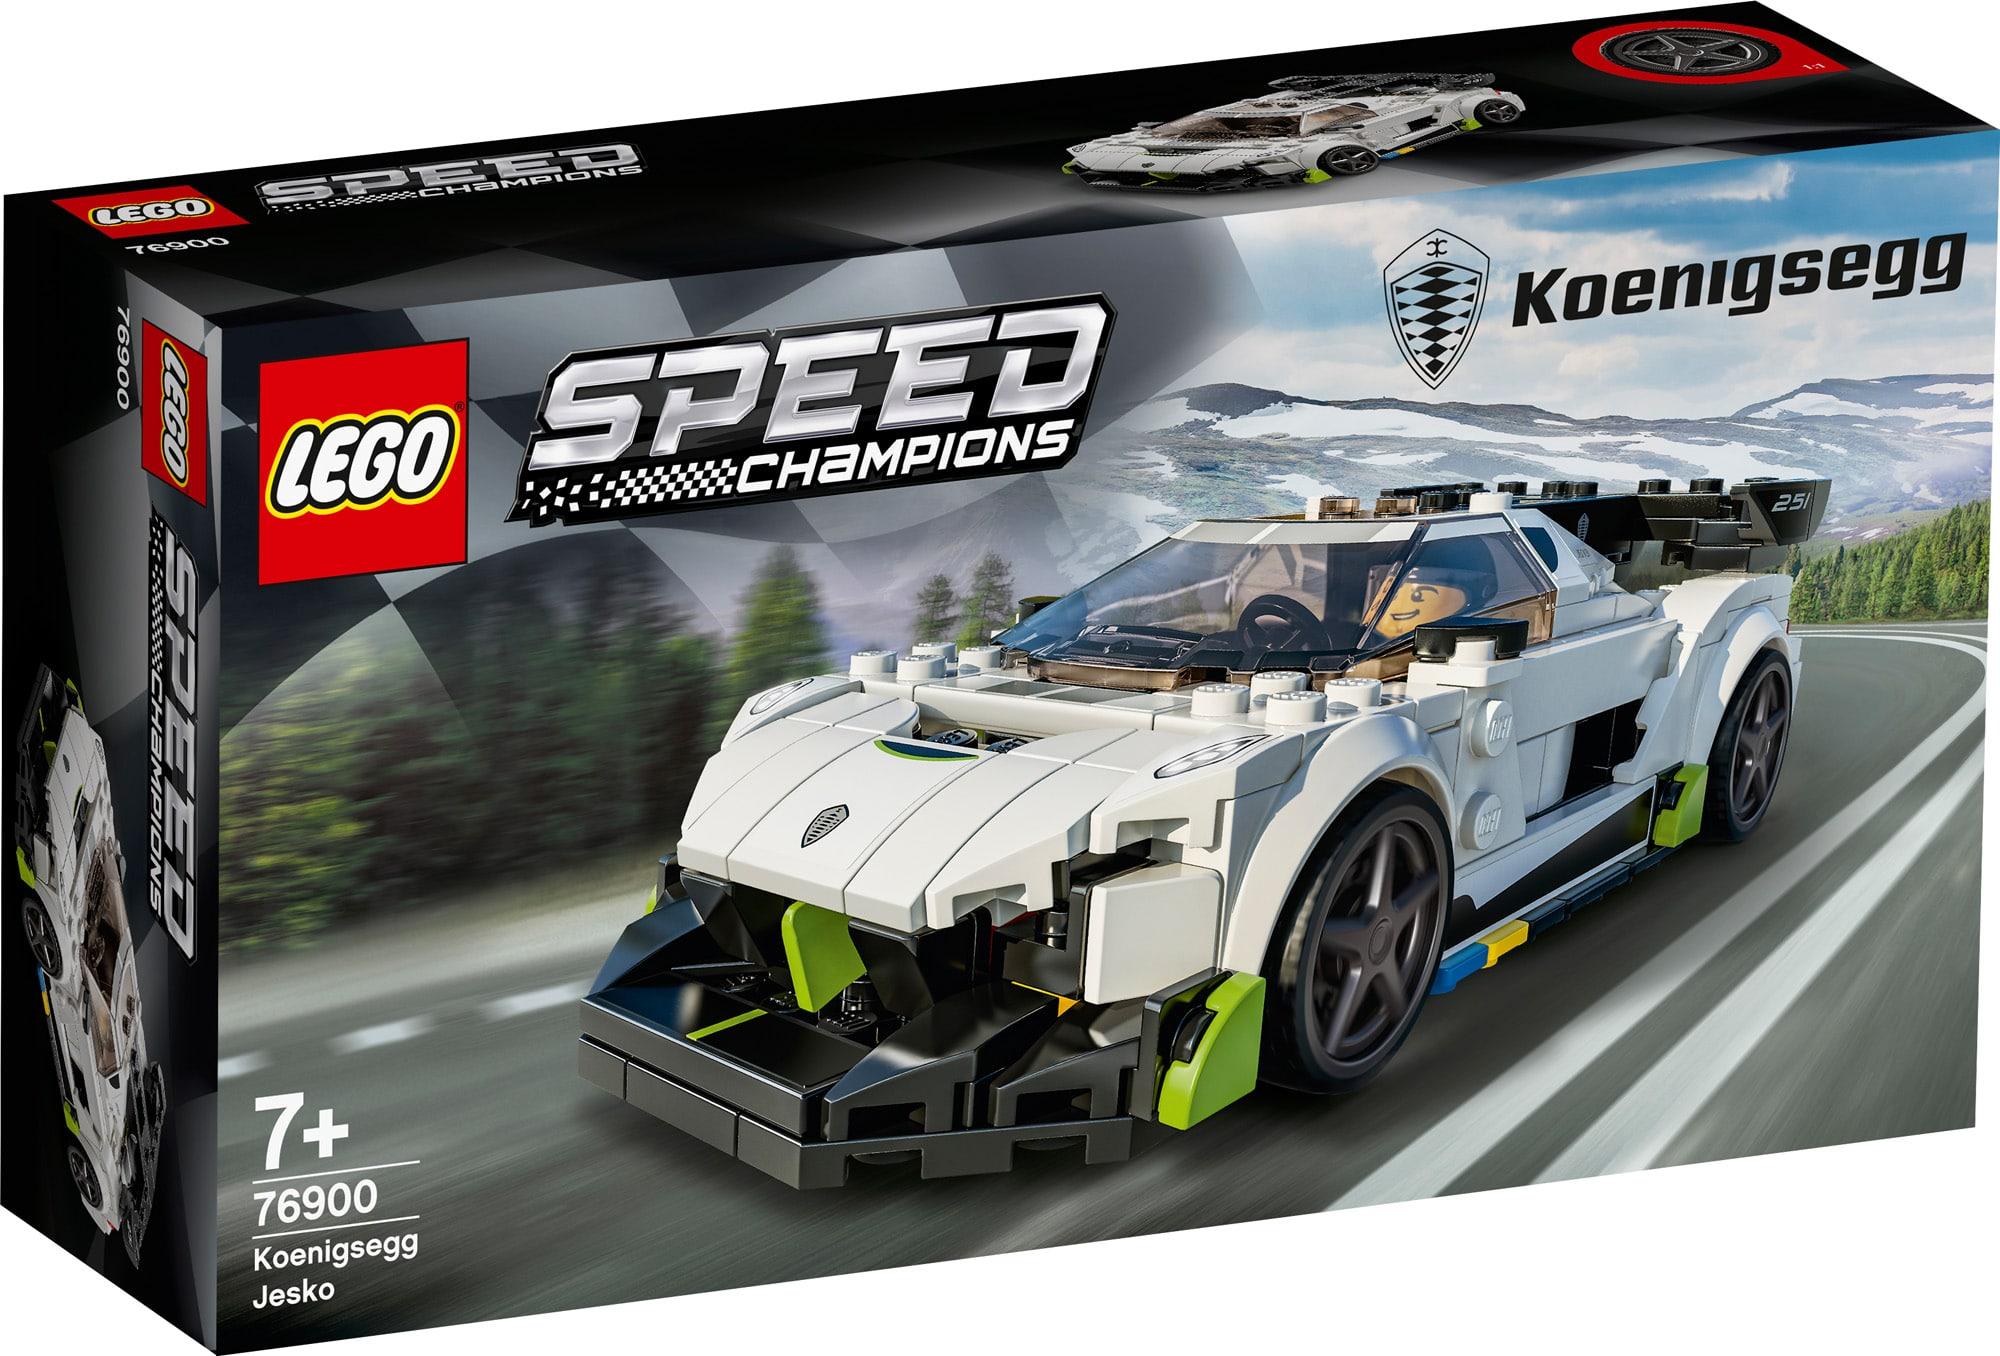 LEGO Speed Champions 76900 Koenigsegg 1